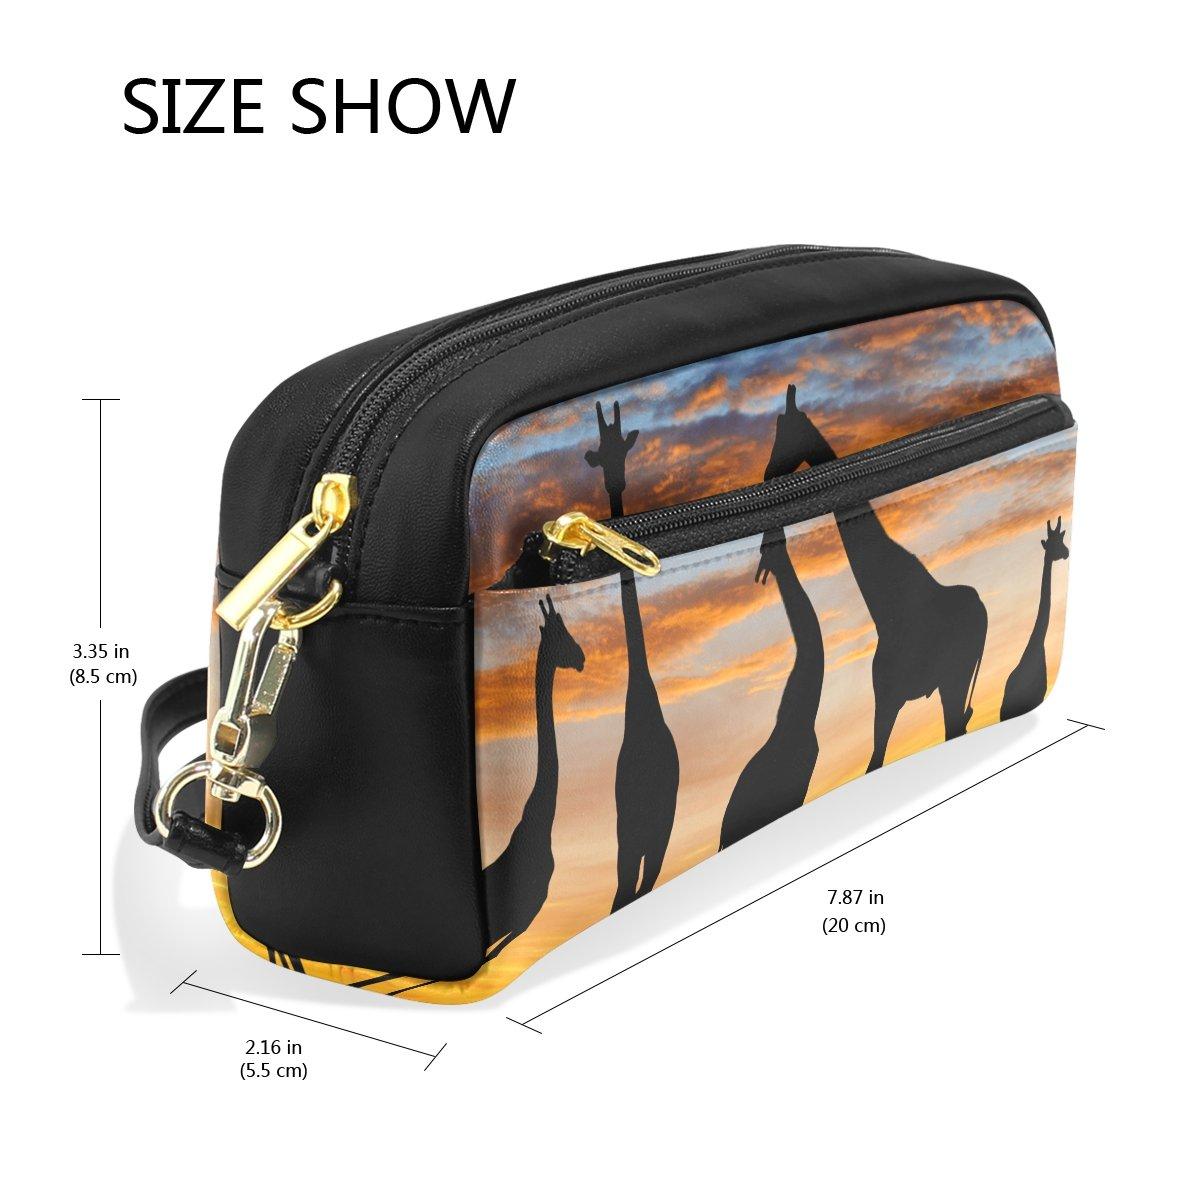 Deyya African Animal Giraffe Sunset School Pencil Bag Accessories Vpd 3 For Children Kids Large Capacity Pen Holder Durable Stationery Pouch Office